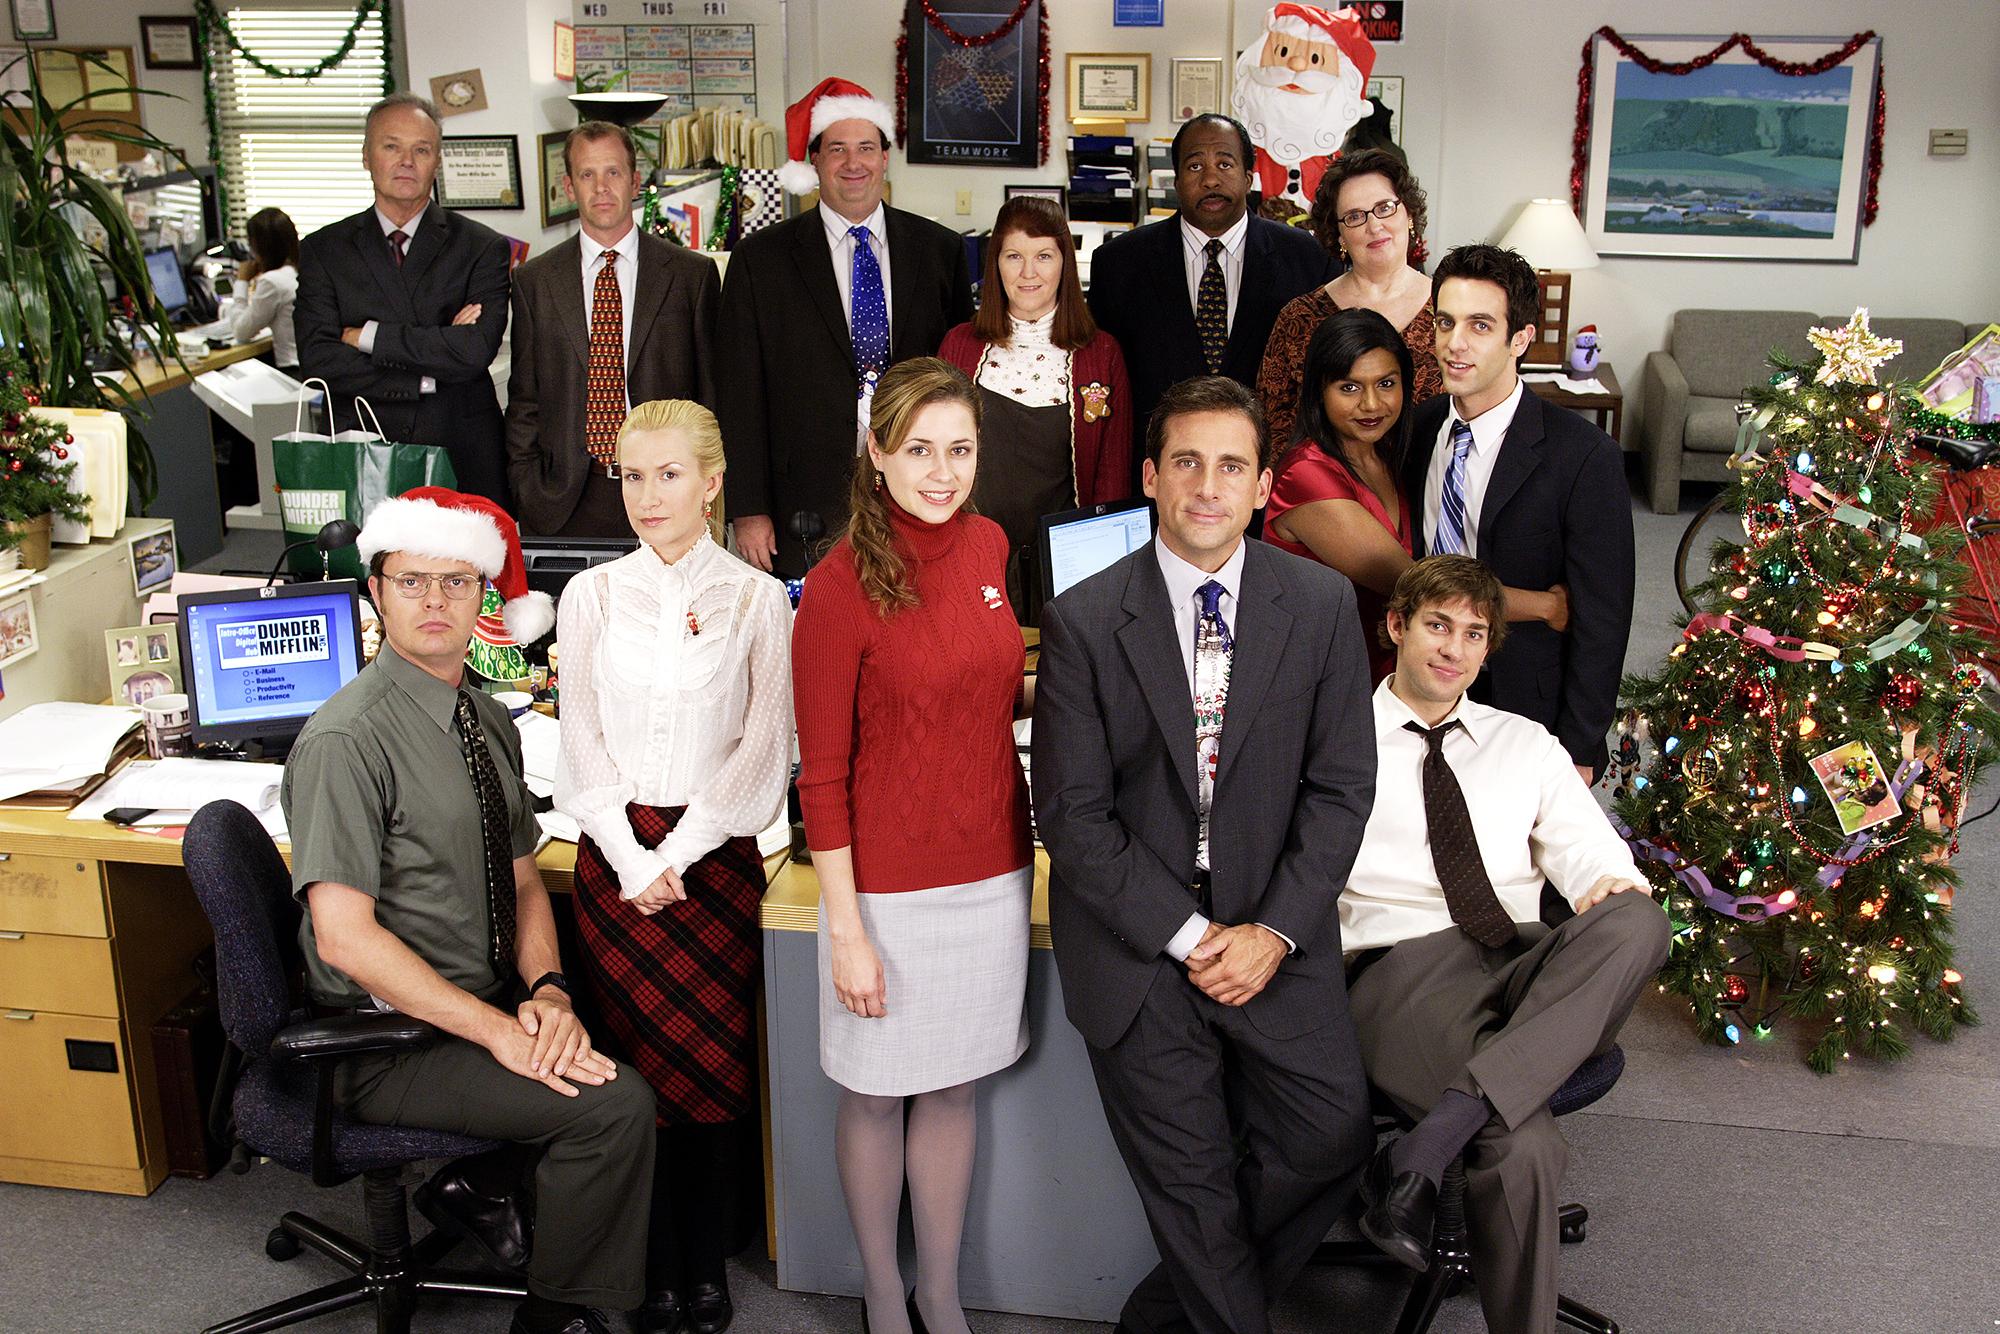 The Office Cast Reunion Brunch Photo